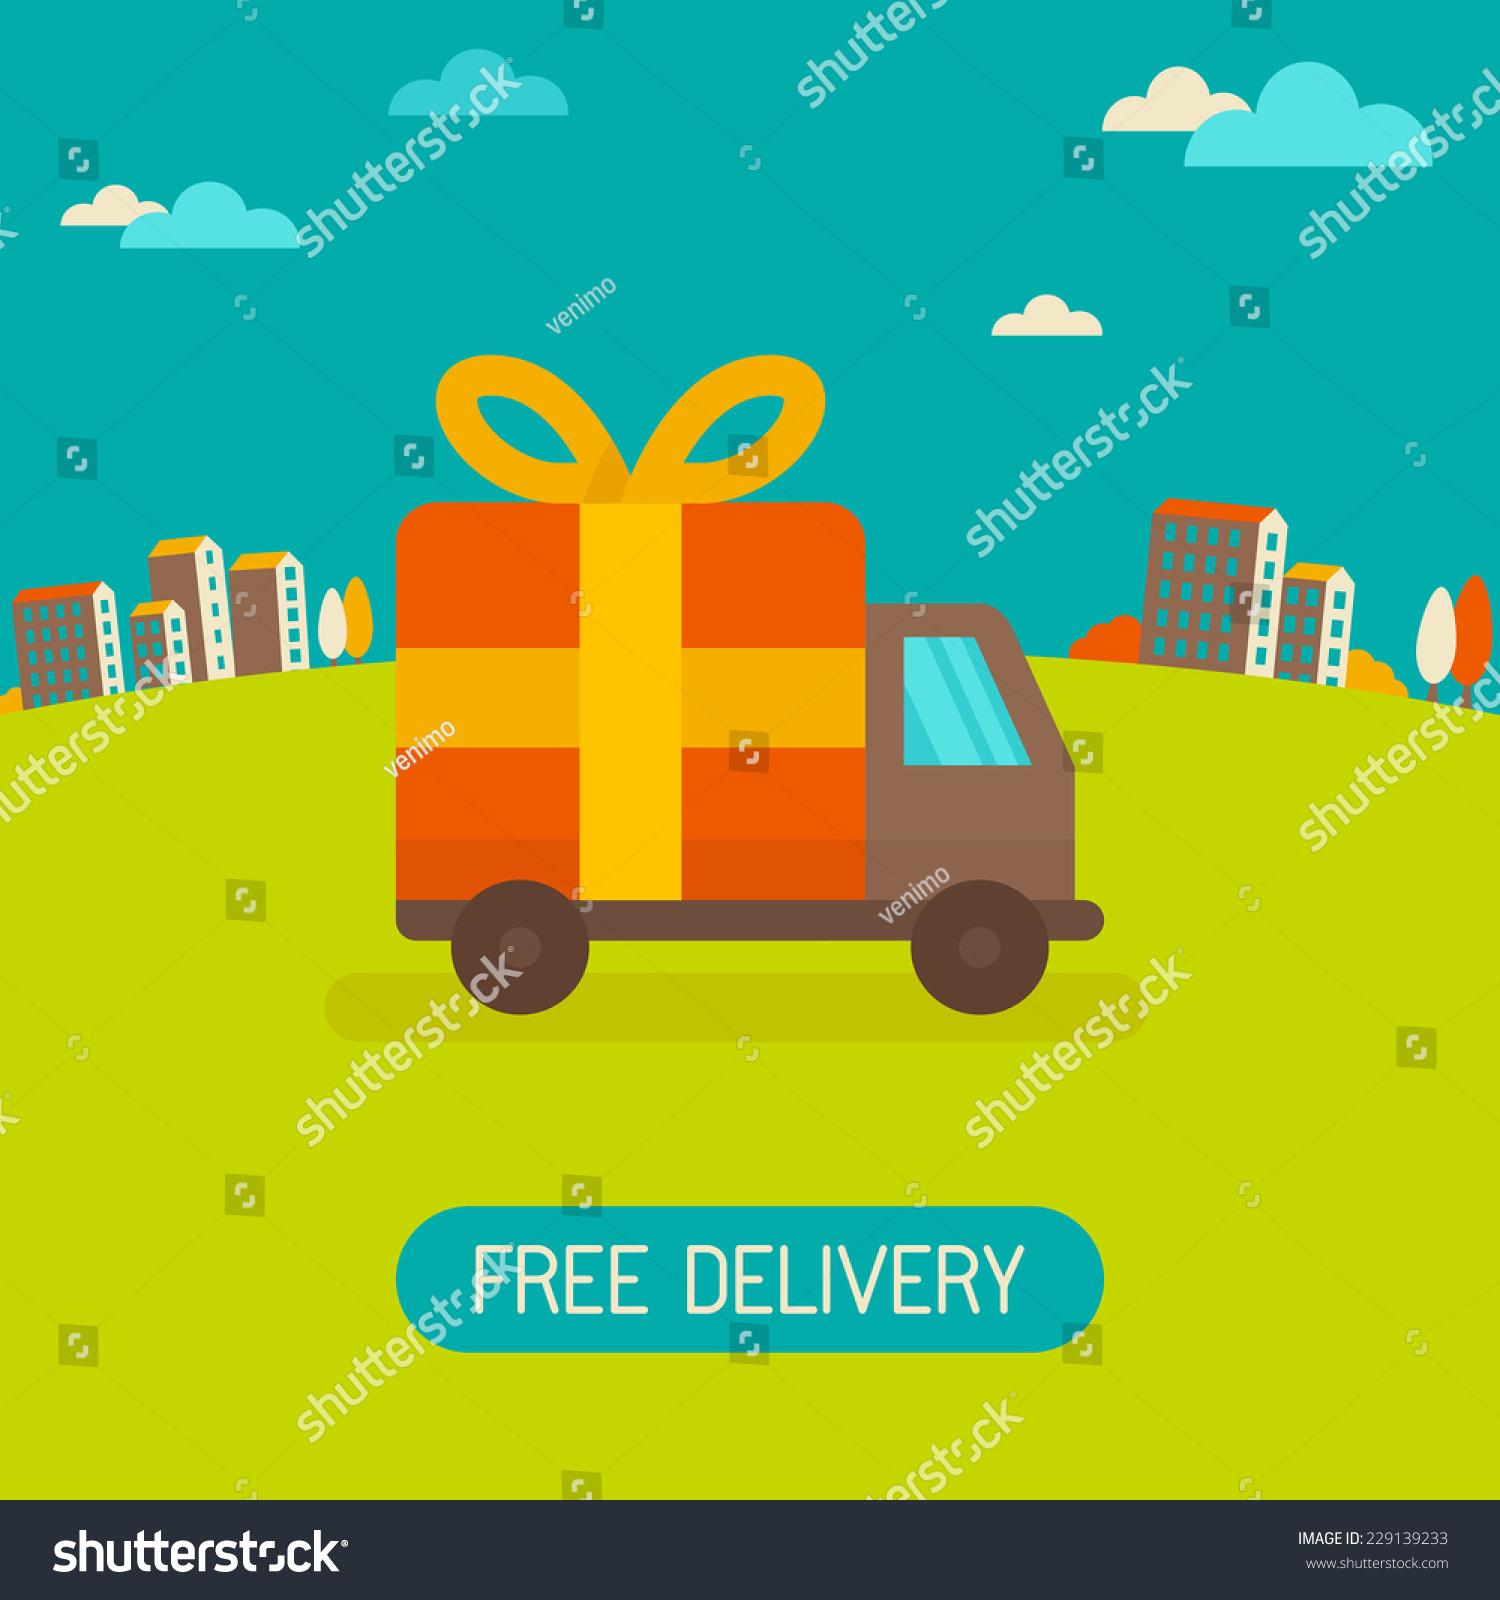 Free banner images for website - Vector Free Delivery Concept In Flat Style Illustration For Banner For Website Transportation Truck